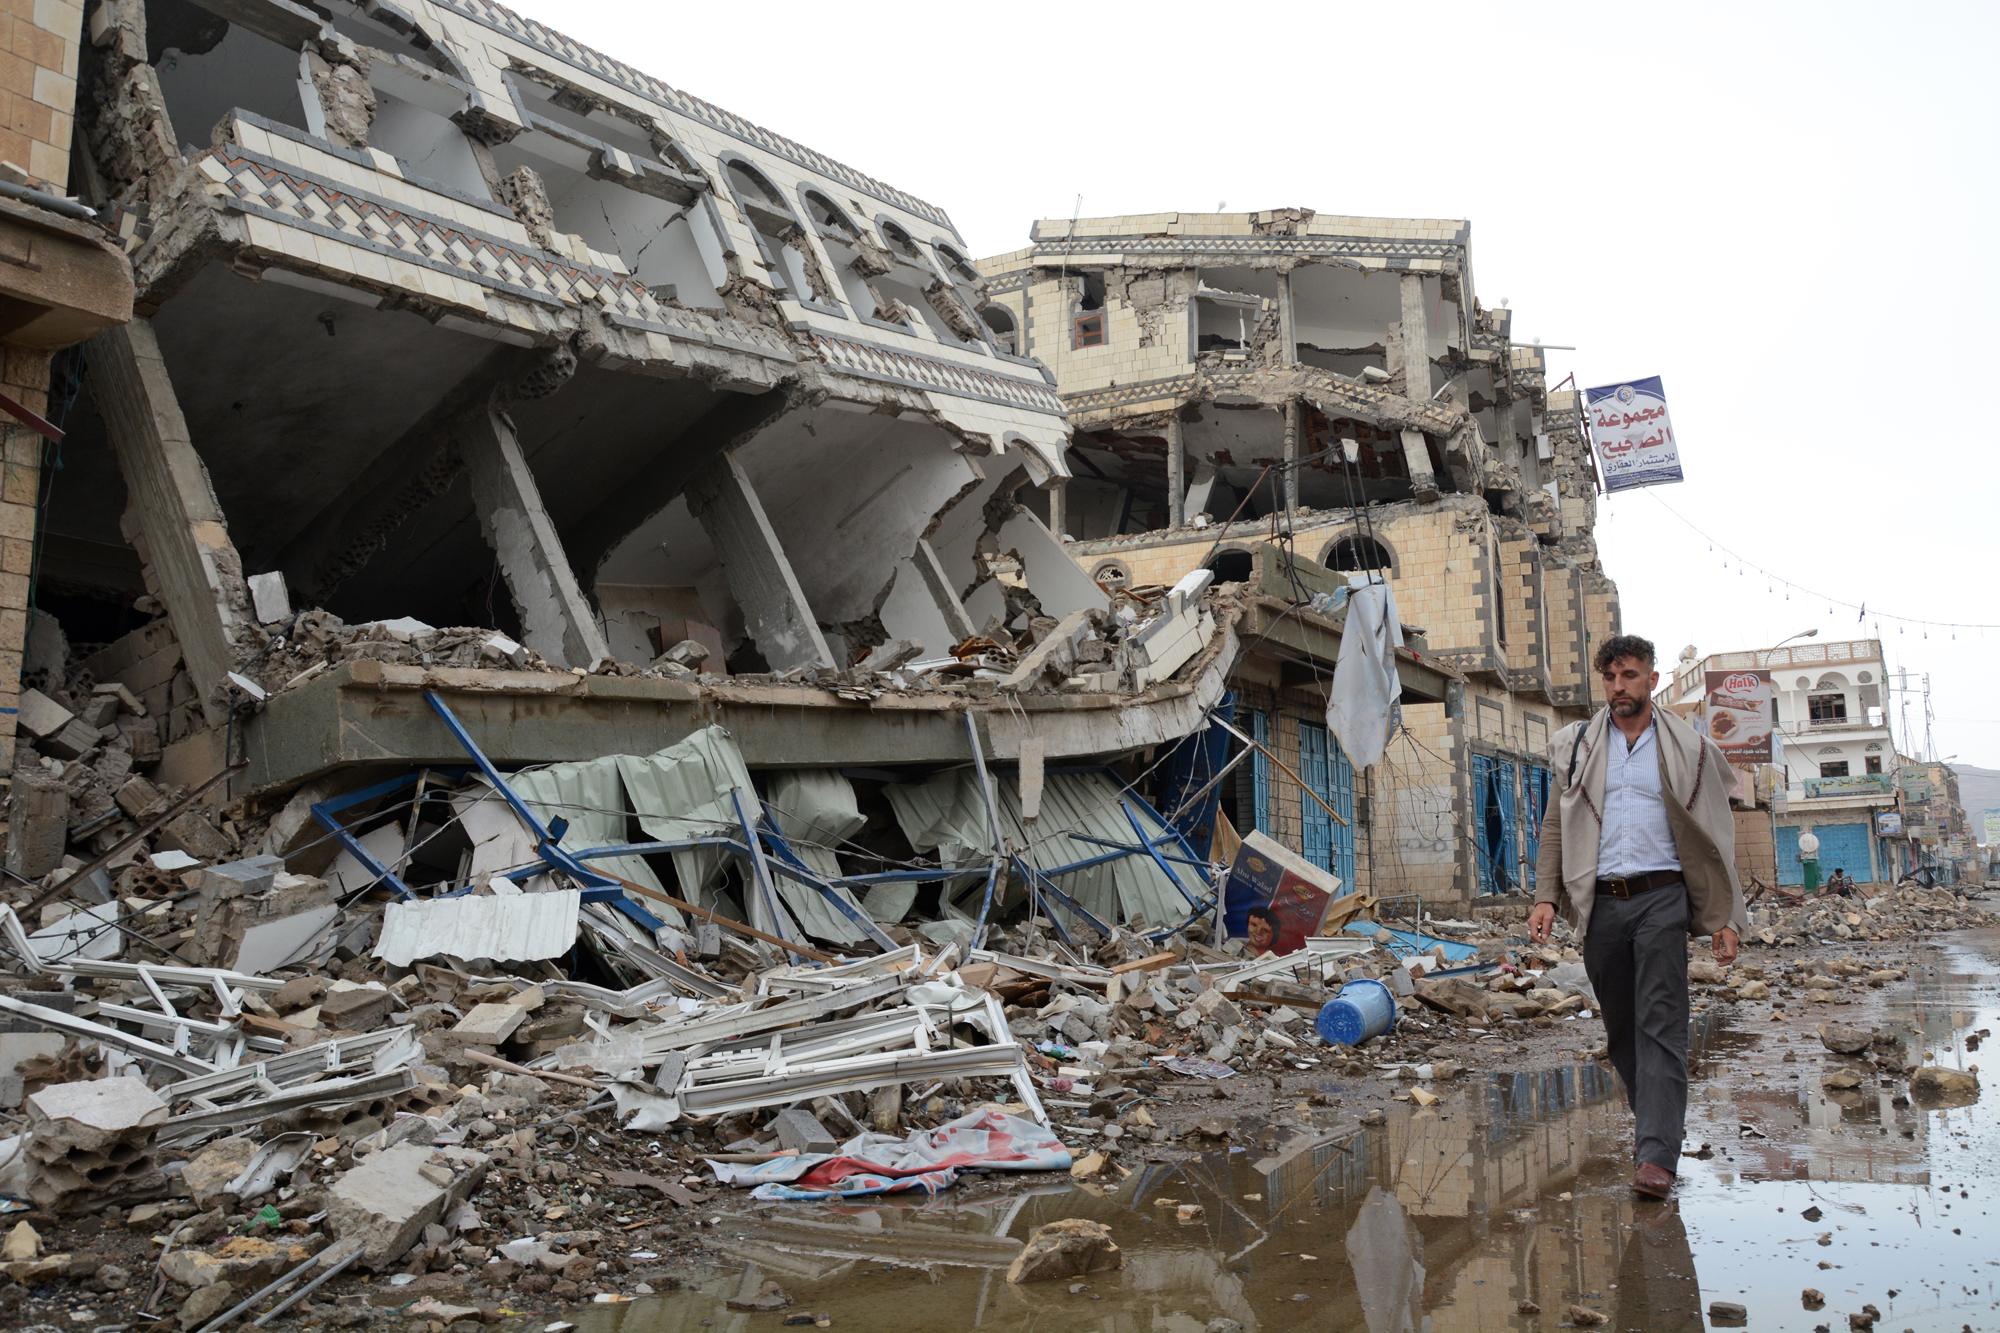 Jemen leidet unter den konstanten Luftangriffen. | Bild (Ausschnitt): ©  United Nations OCHA [CC BY-NC-ND 2.0]  - Flickr